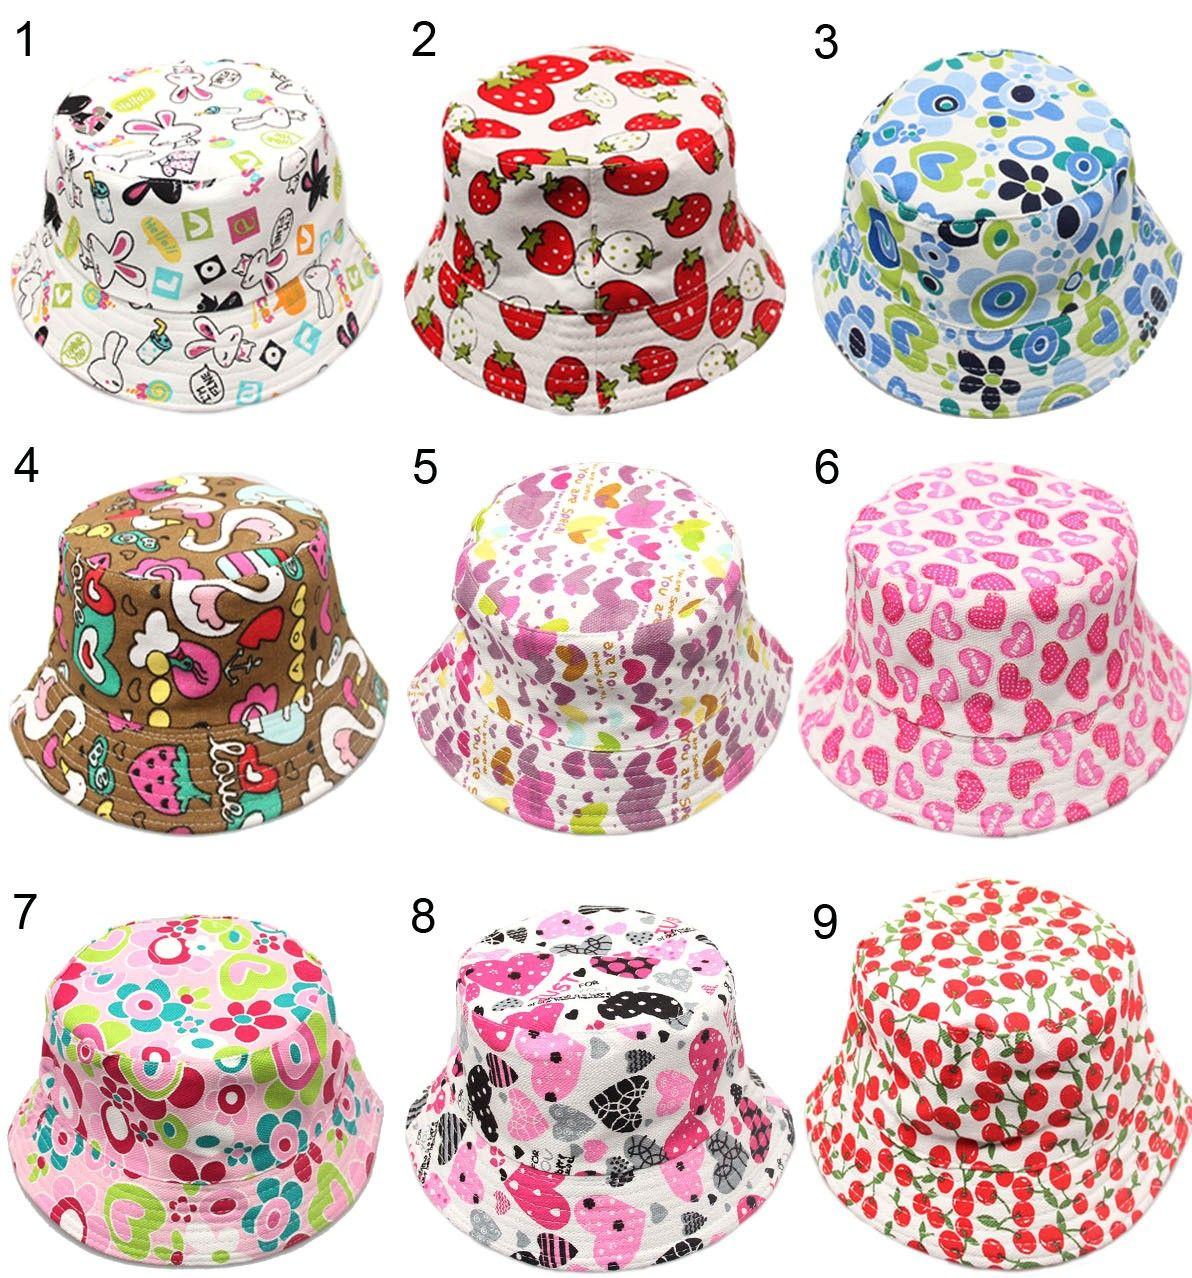 fbe0f2530f7 2019 Designer Childrens Honey Flower Bucket Hats For Kids Packable Foldable  Fishing Caps Baby Summer Wide Brimmed Beach Sun Visor Cappelli Gift From ...